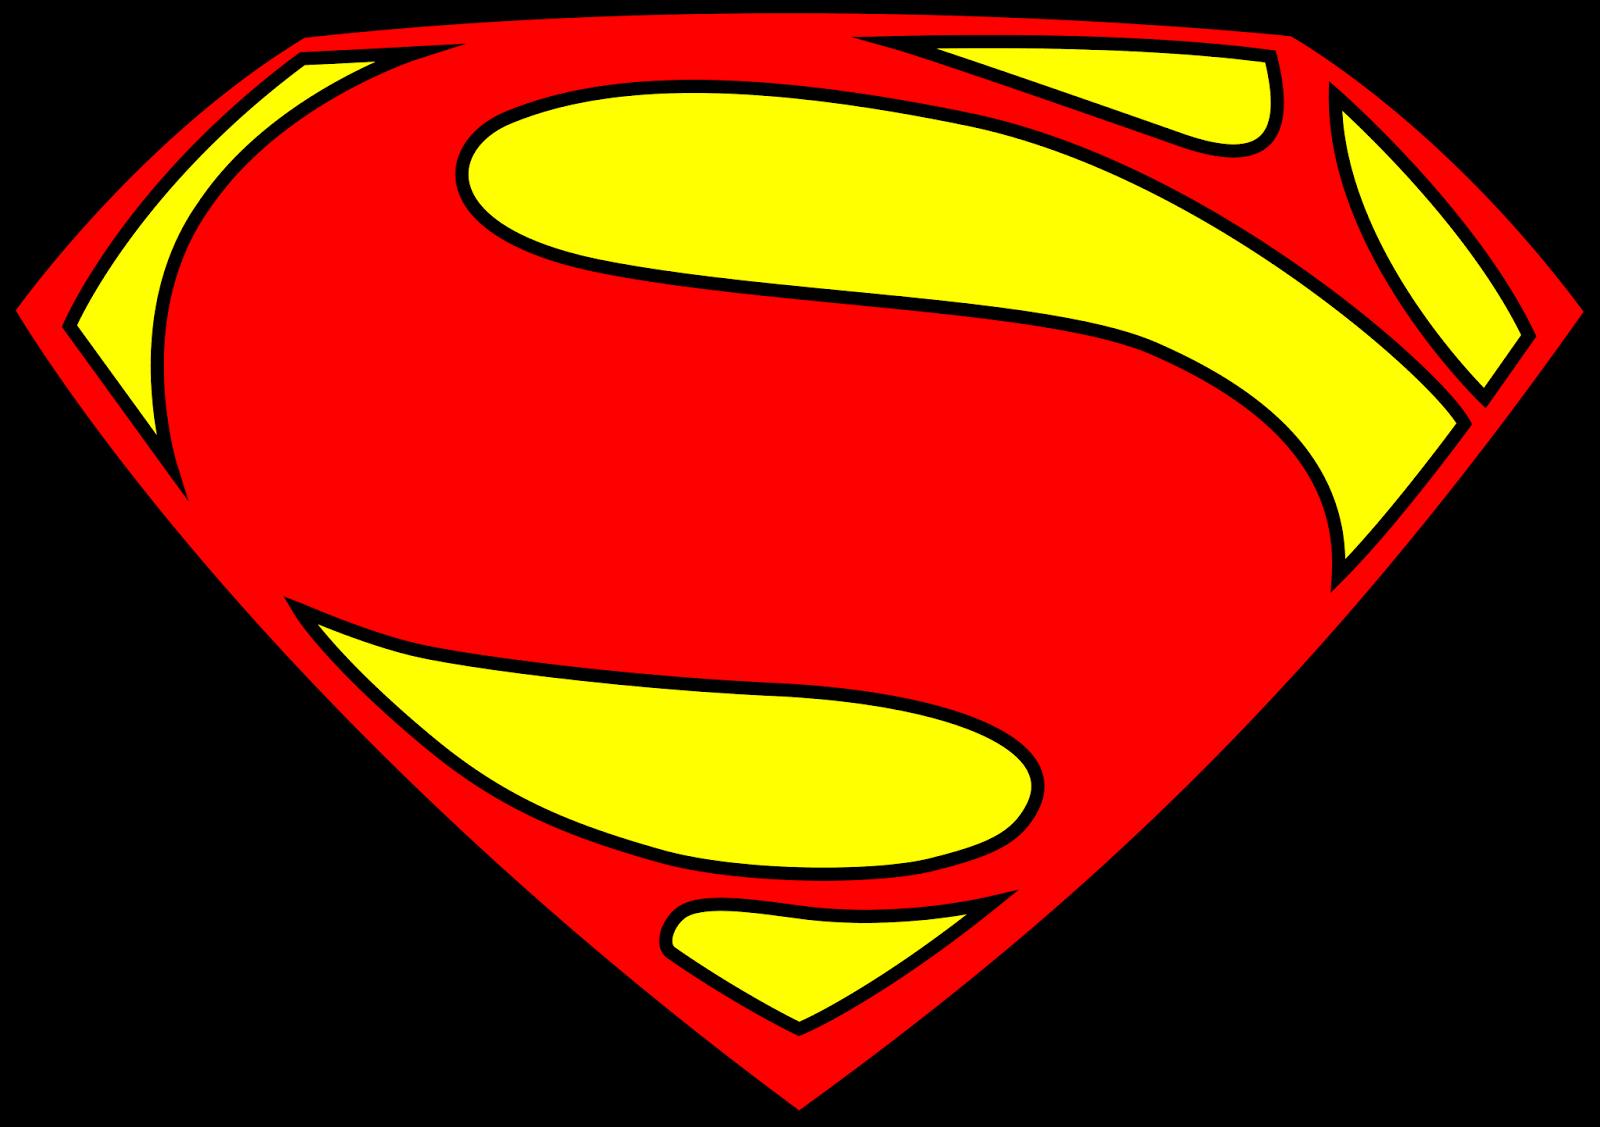 http://intothecomicverse.blogspot.com.br/2015/04/superman-mini-guia-de-leitura-parte-3.html